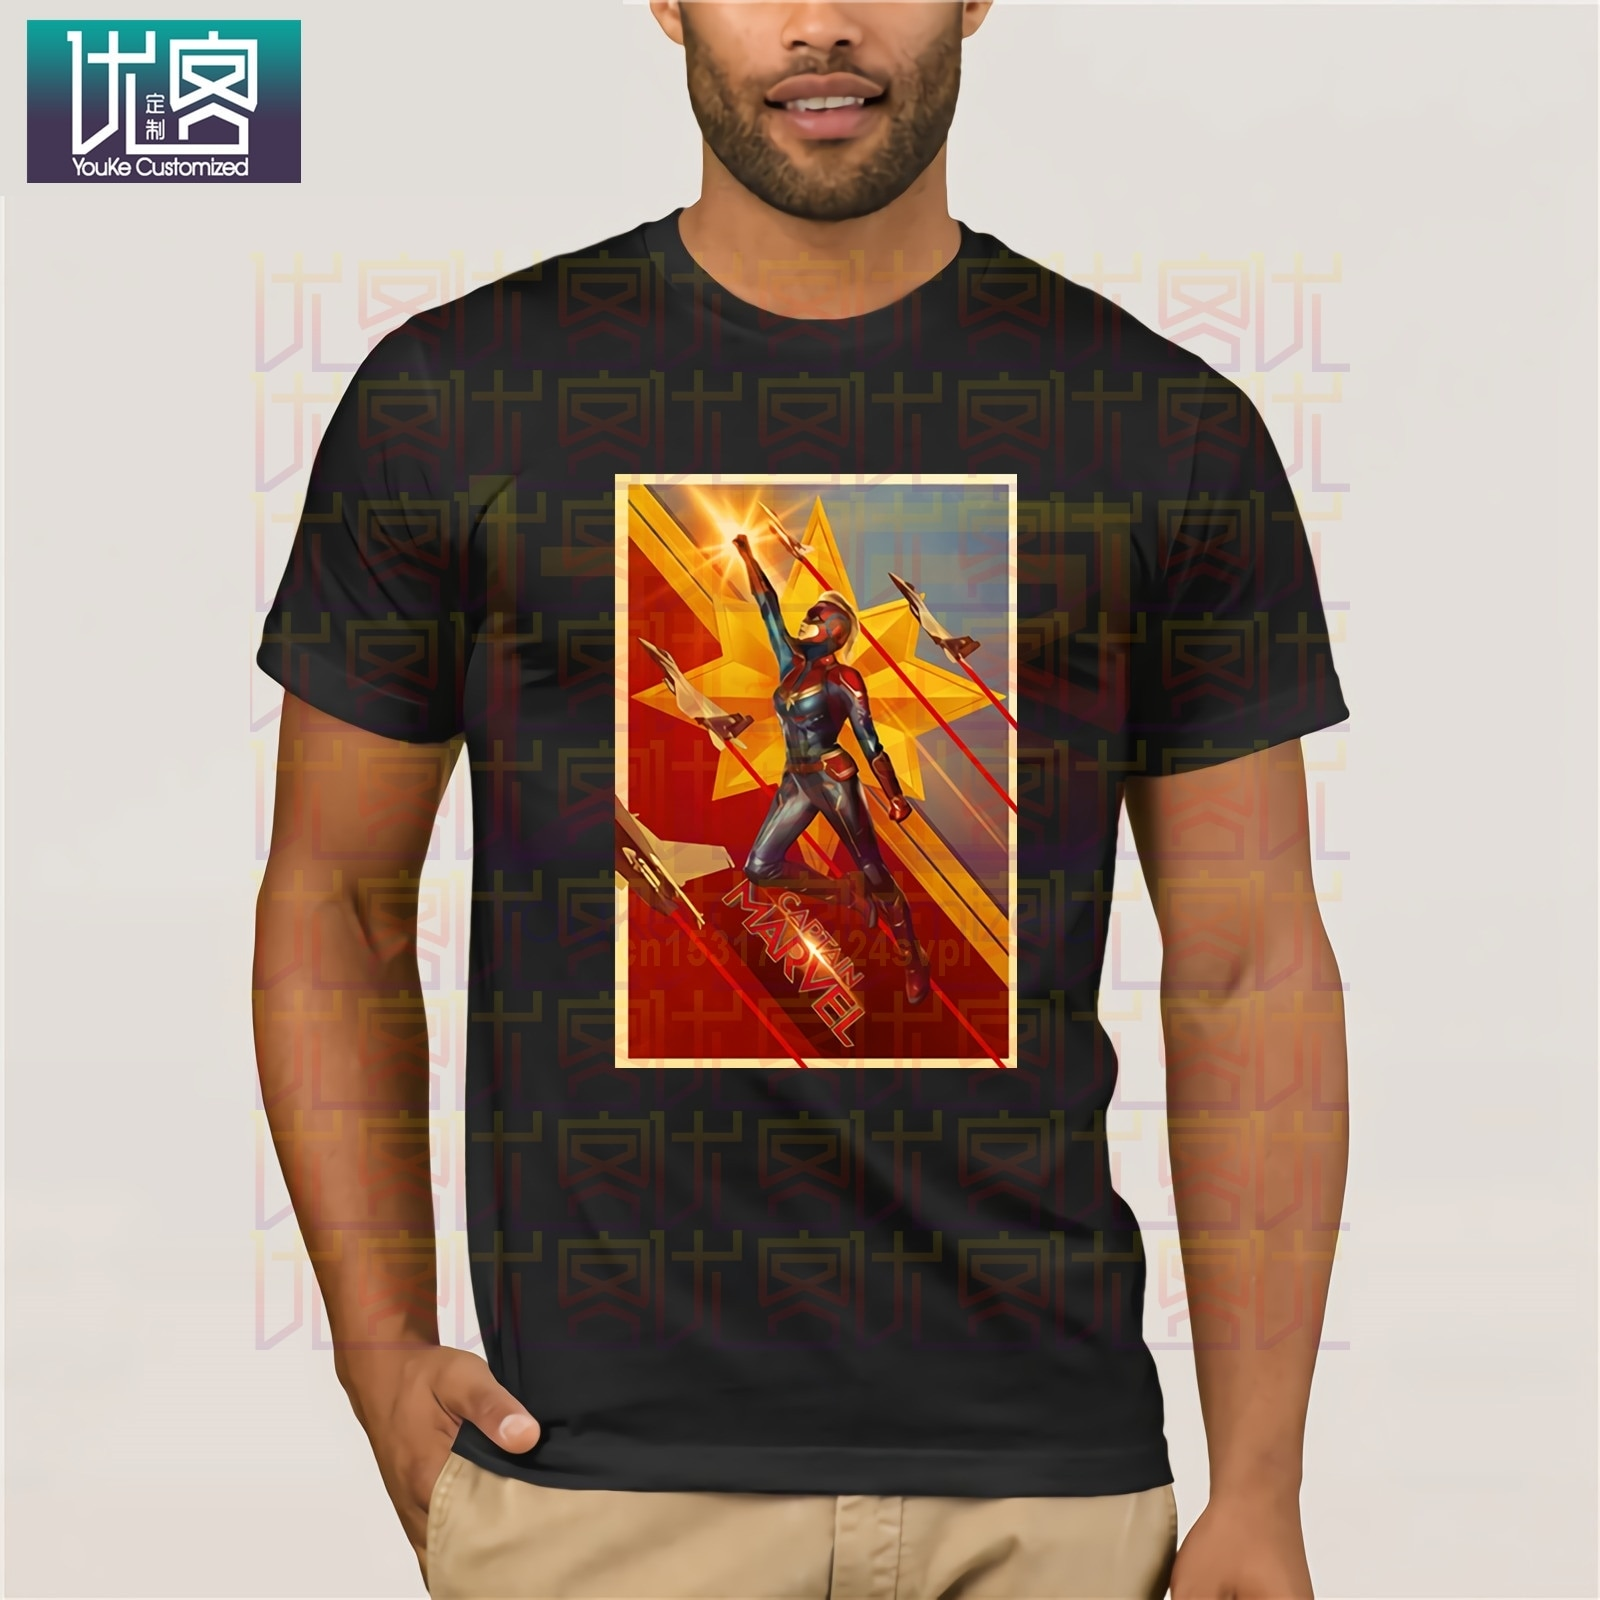 Captain Marvel Movie Fashion Tees T-Shirt Funny Cartoon Print Men Women Tee Shirt Short Sleeve T Shirt Male